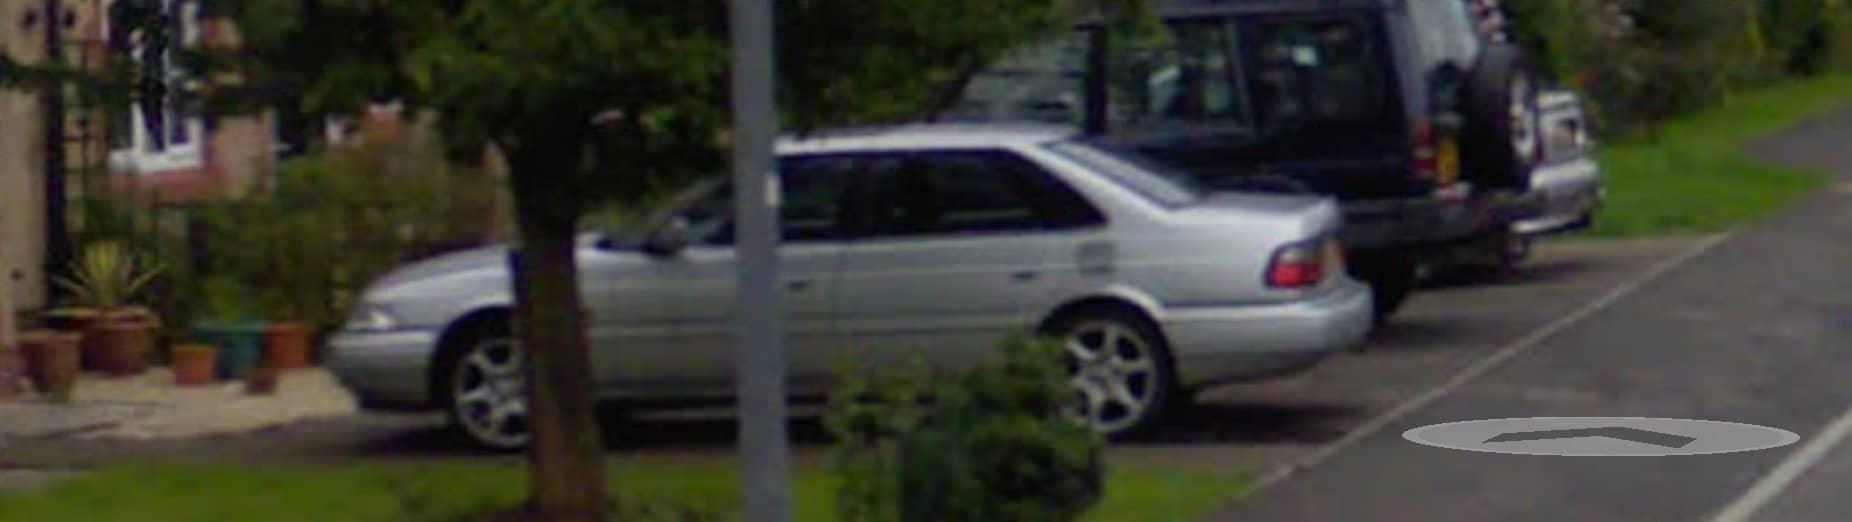 Rover 800 Vitesse, Rover 800, Rover, 800, 800 Vitesse, Vitesse, saloon car, turbocharged, Longbridge, car, project car, motoring, automotive, car, cars, classic car, retro car, old car, featured